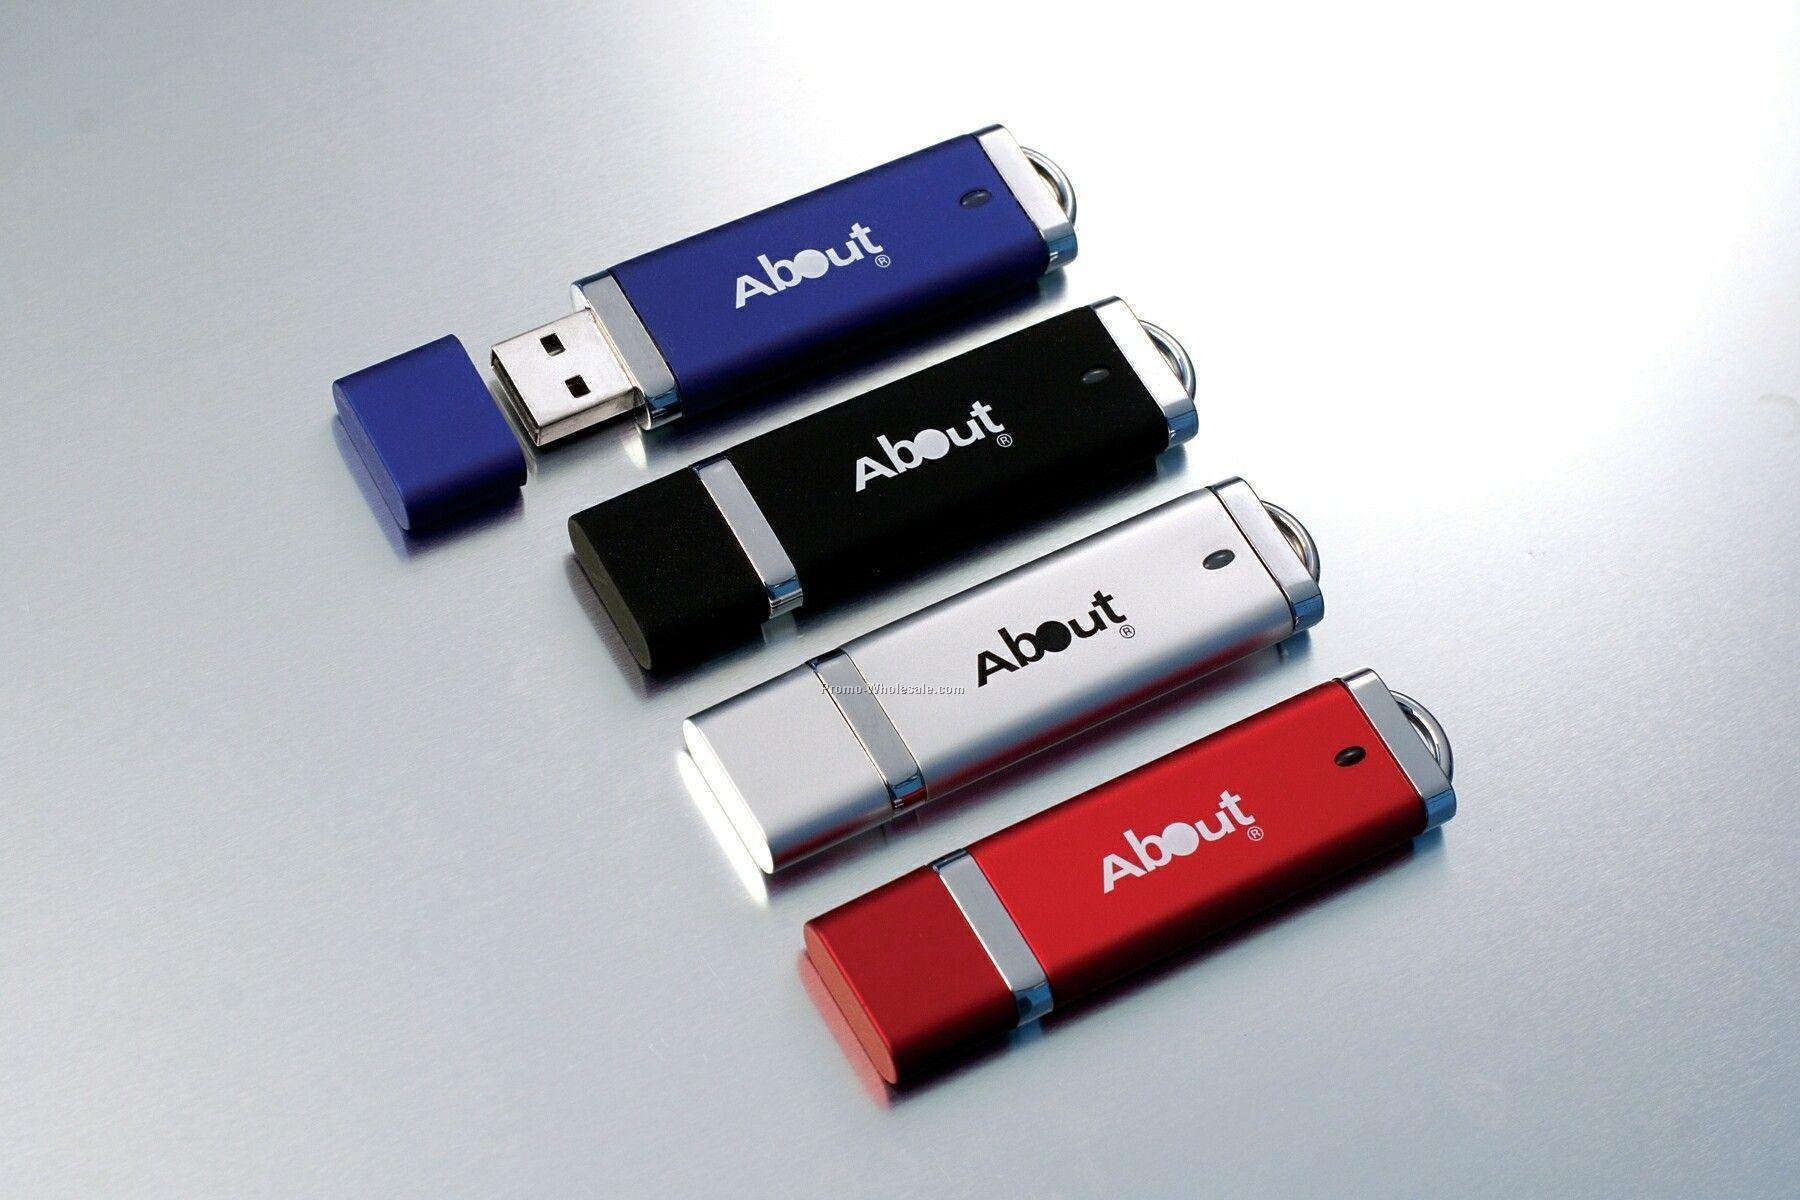 USB nhựa giá rẻ 06-3